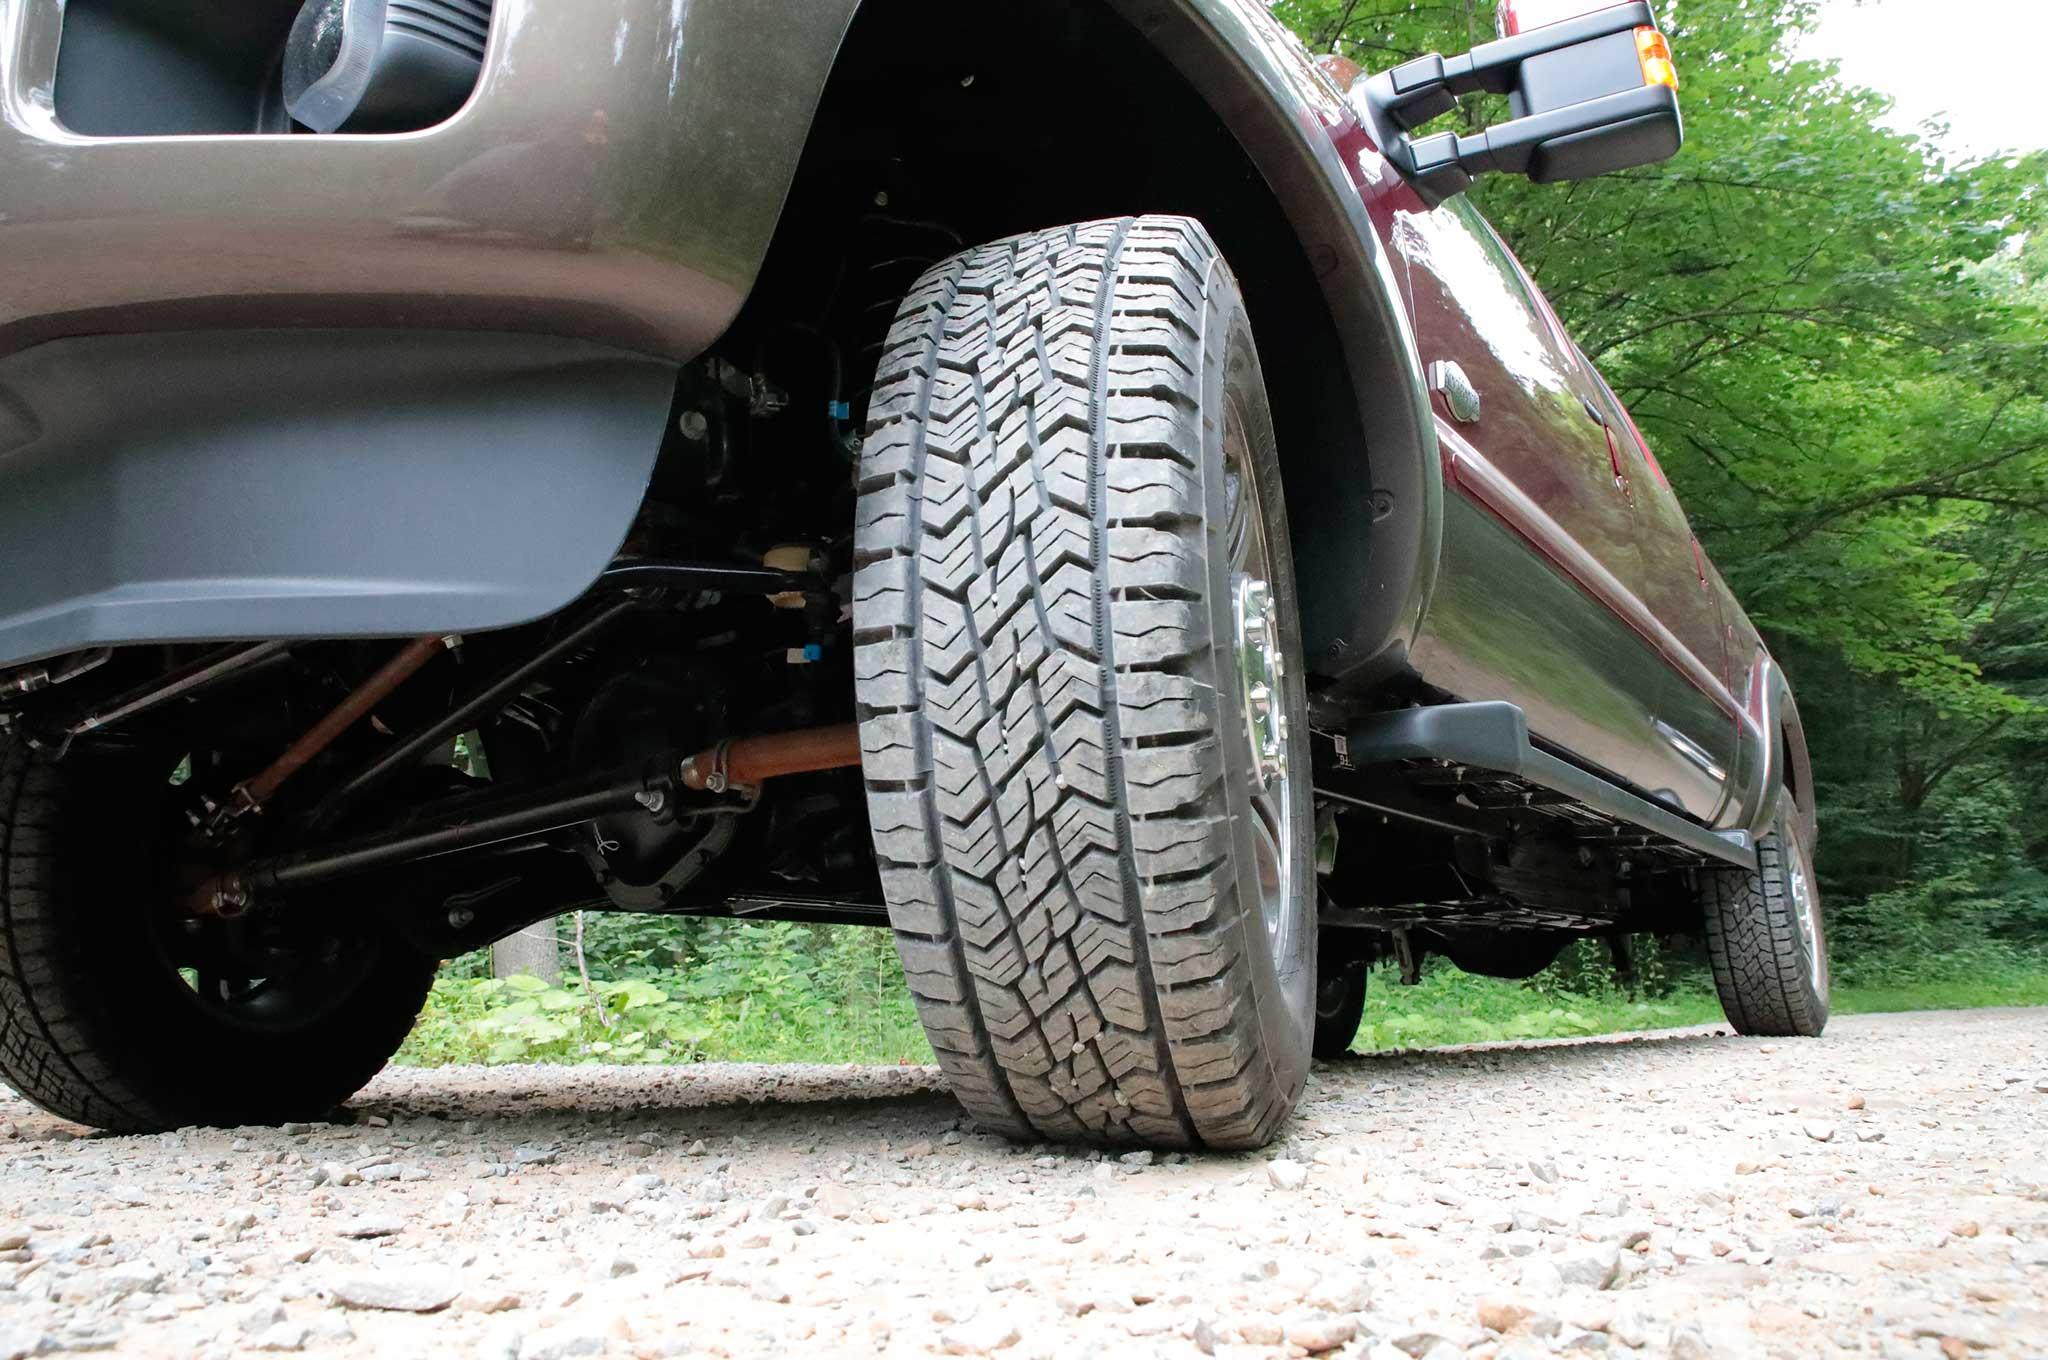 Lowrider Review Continental Tires Terraincontact A T 2001 Chevy Silverado Rear Bumper Wiring Diagram 1 4